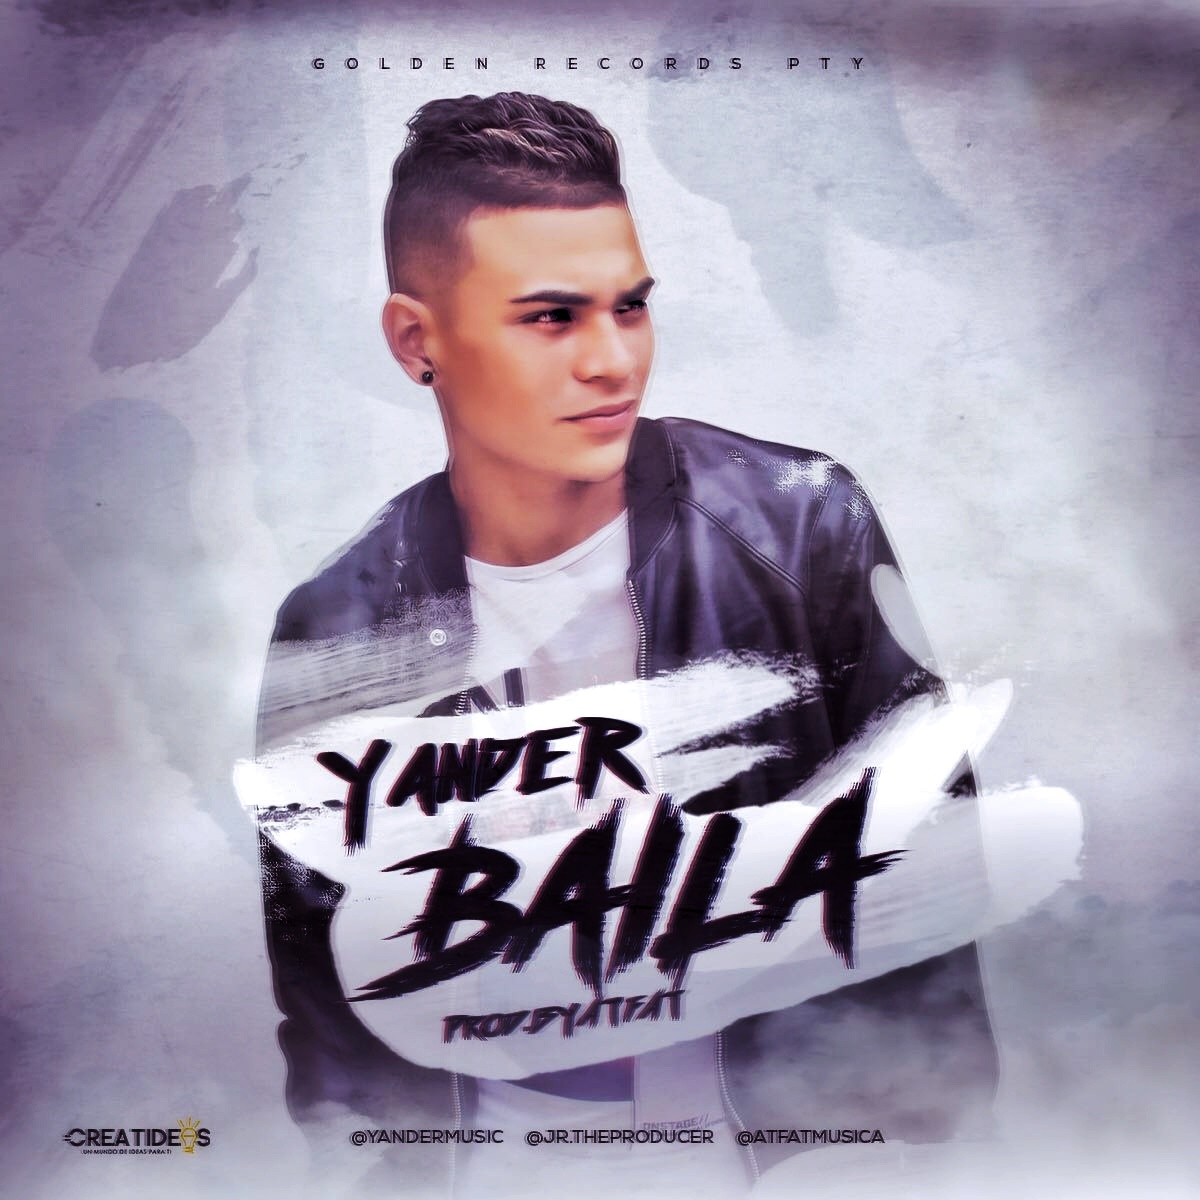 Yander - Baila